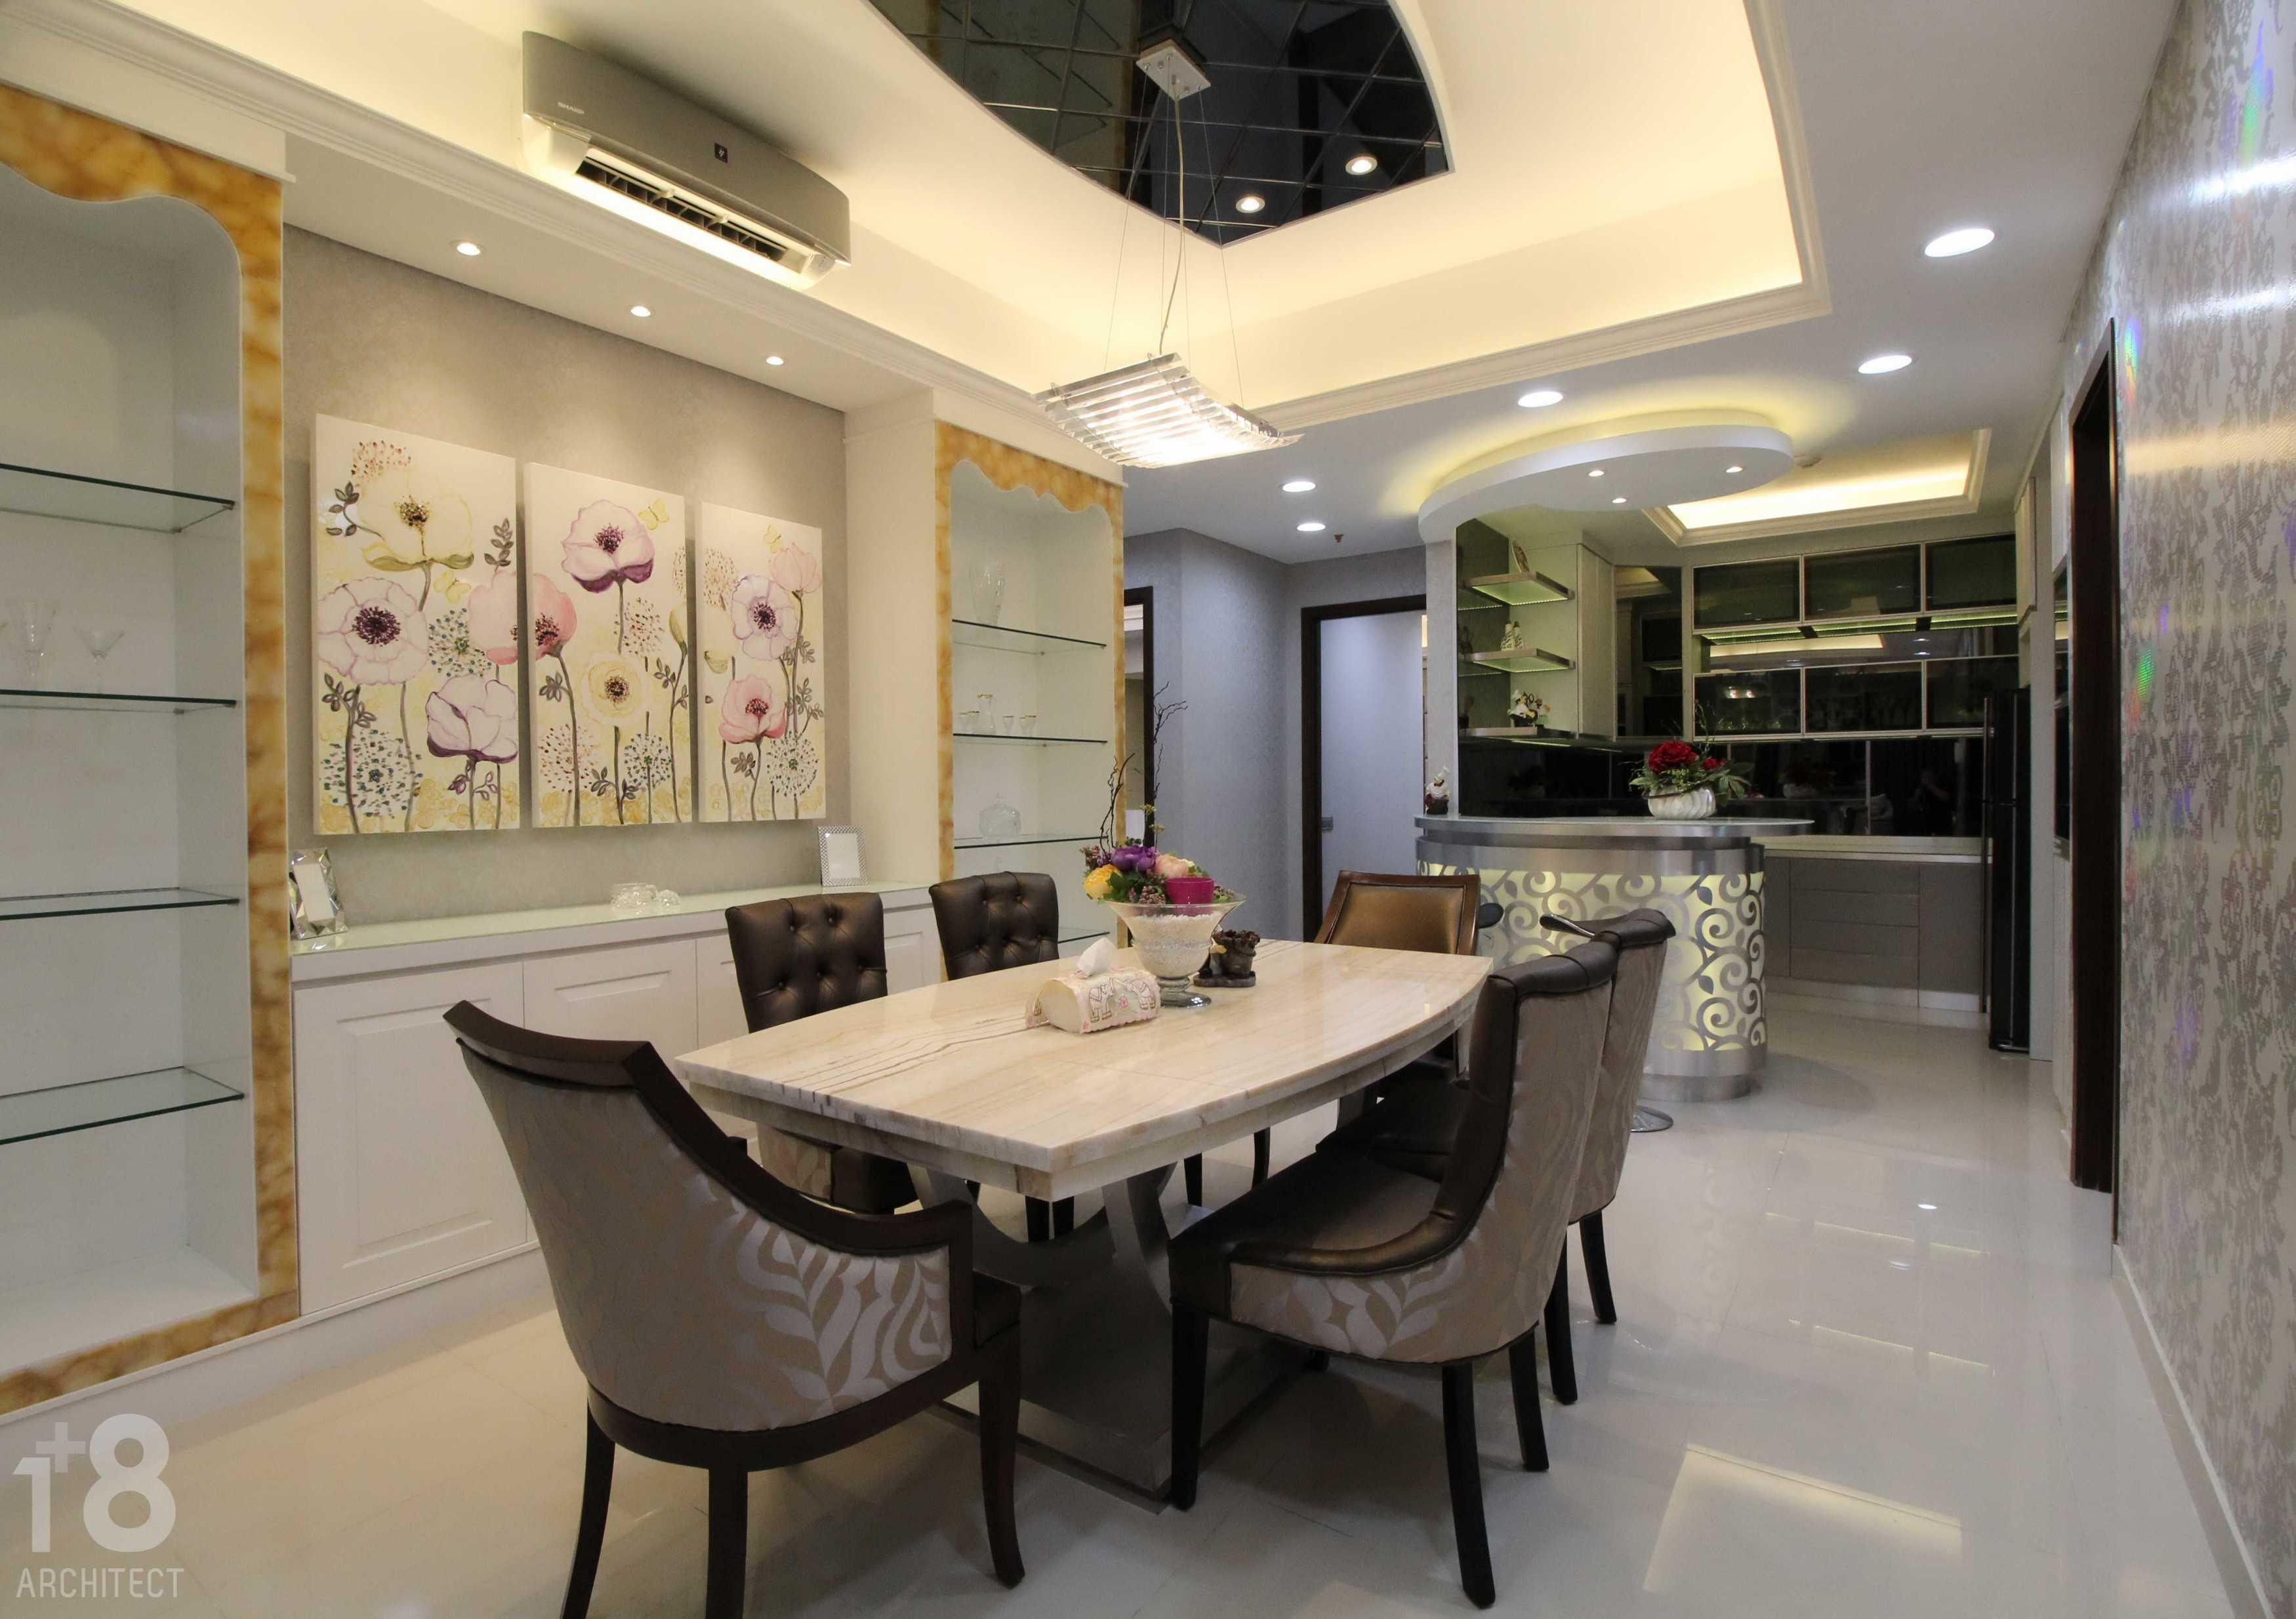 1+8 Architect St. Moritz, Presidential Tower Suite Room Jakarta, Indonesia Jakarta, Indonesia Dining Room Modern  23009